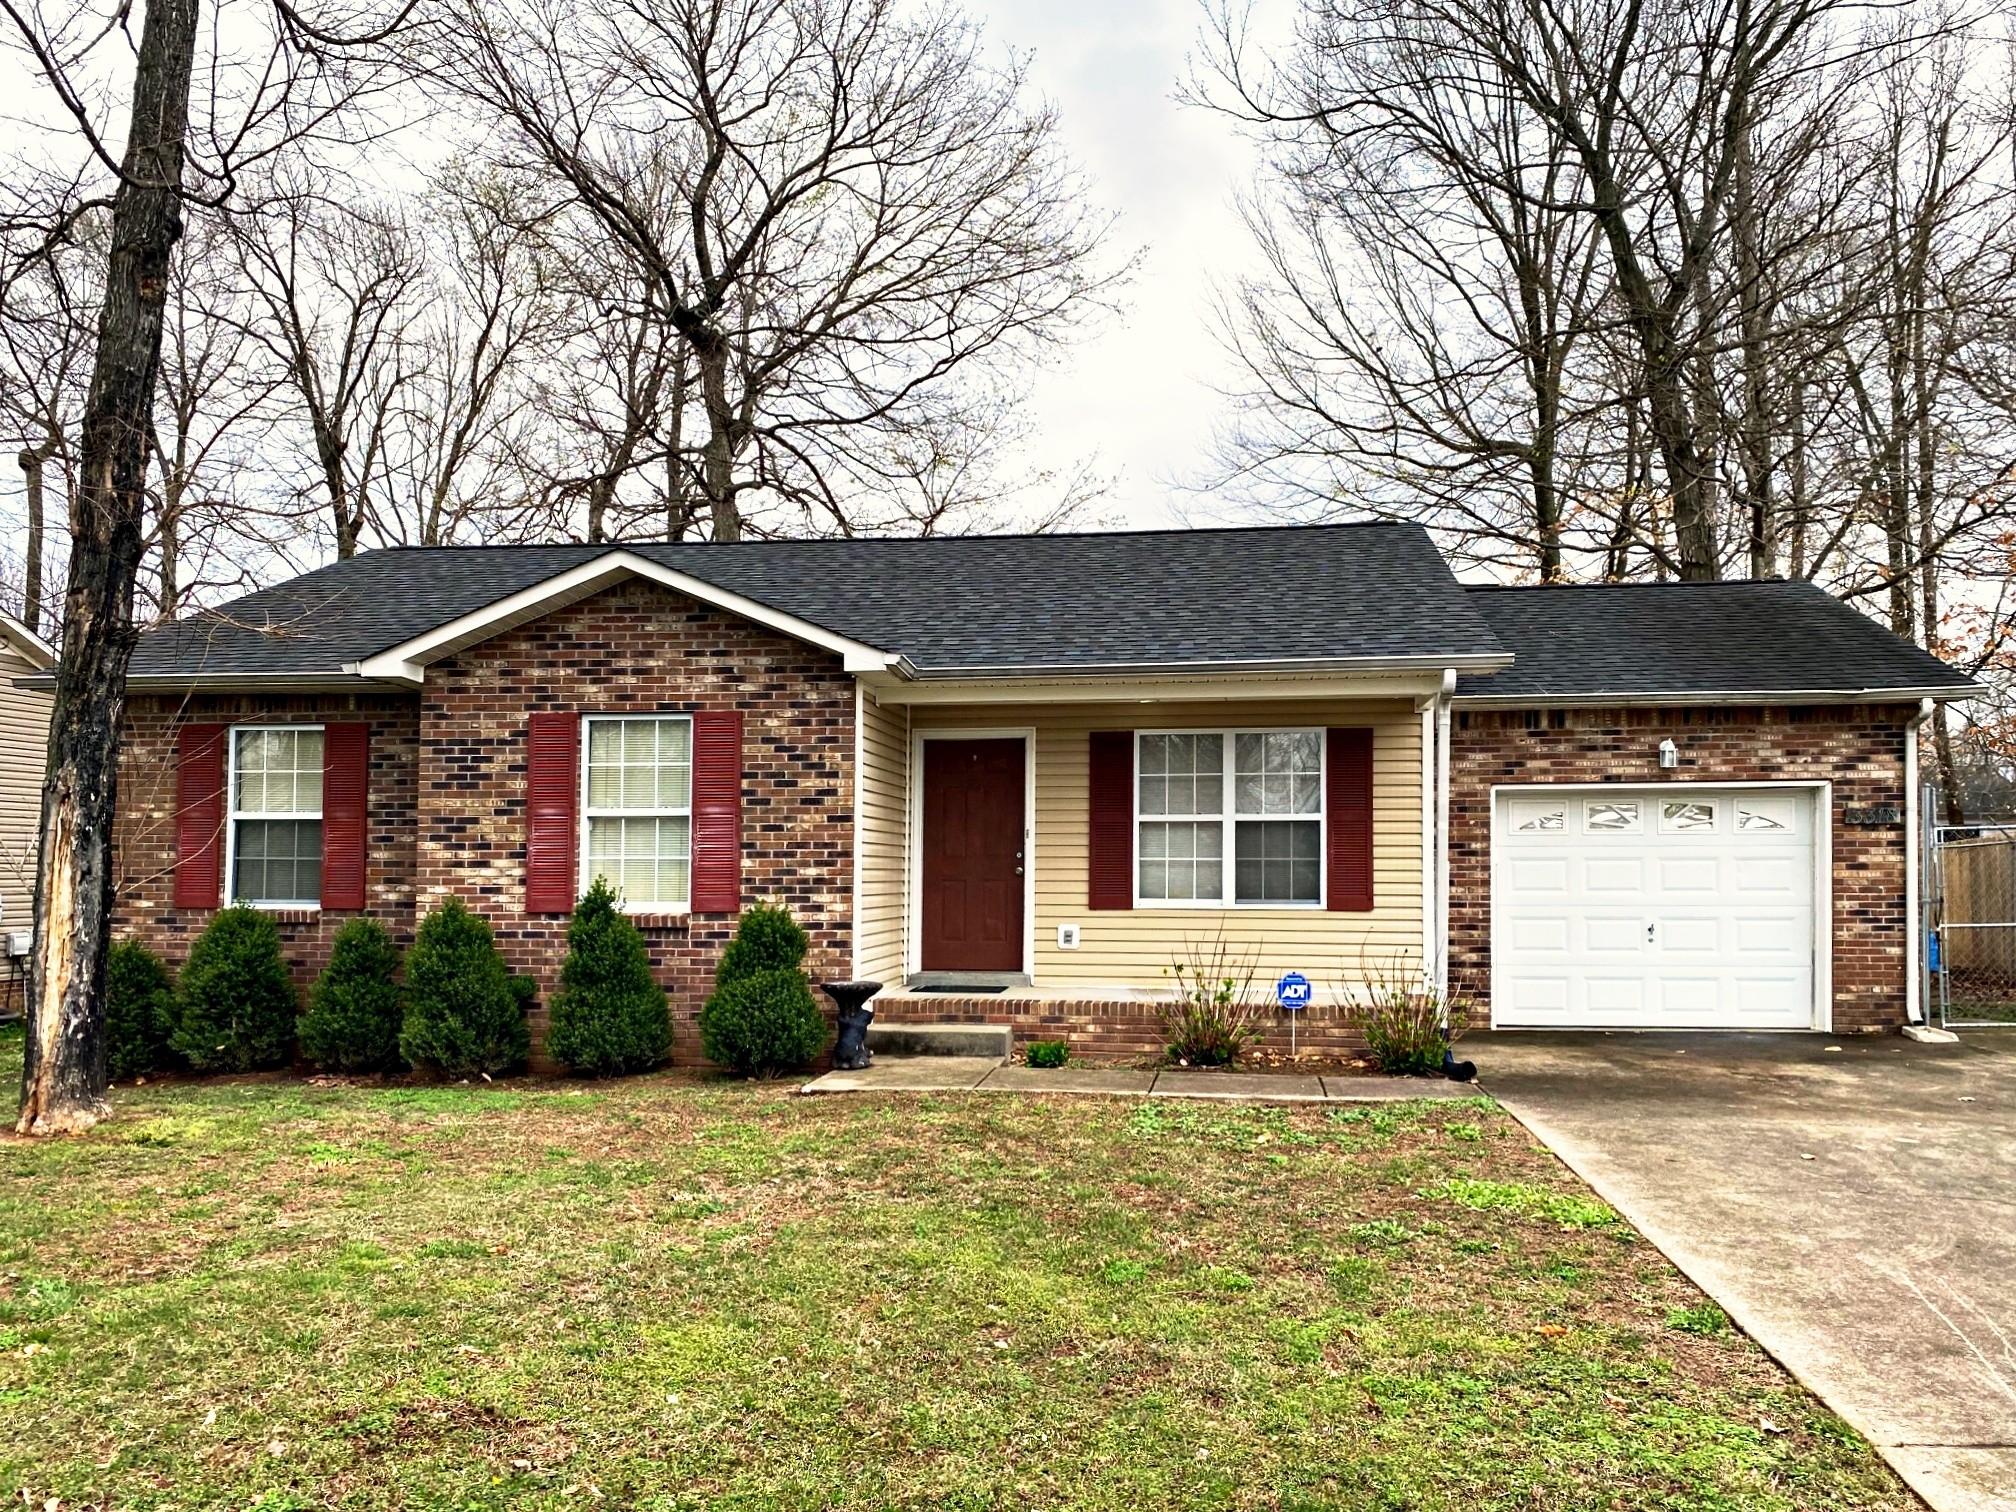 3318 S Senseney Cir Property Photo - Clarksville, TN real estate listing